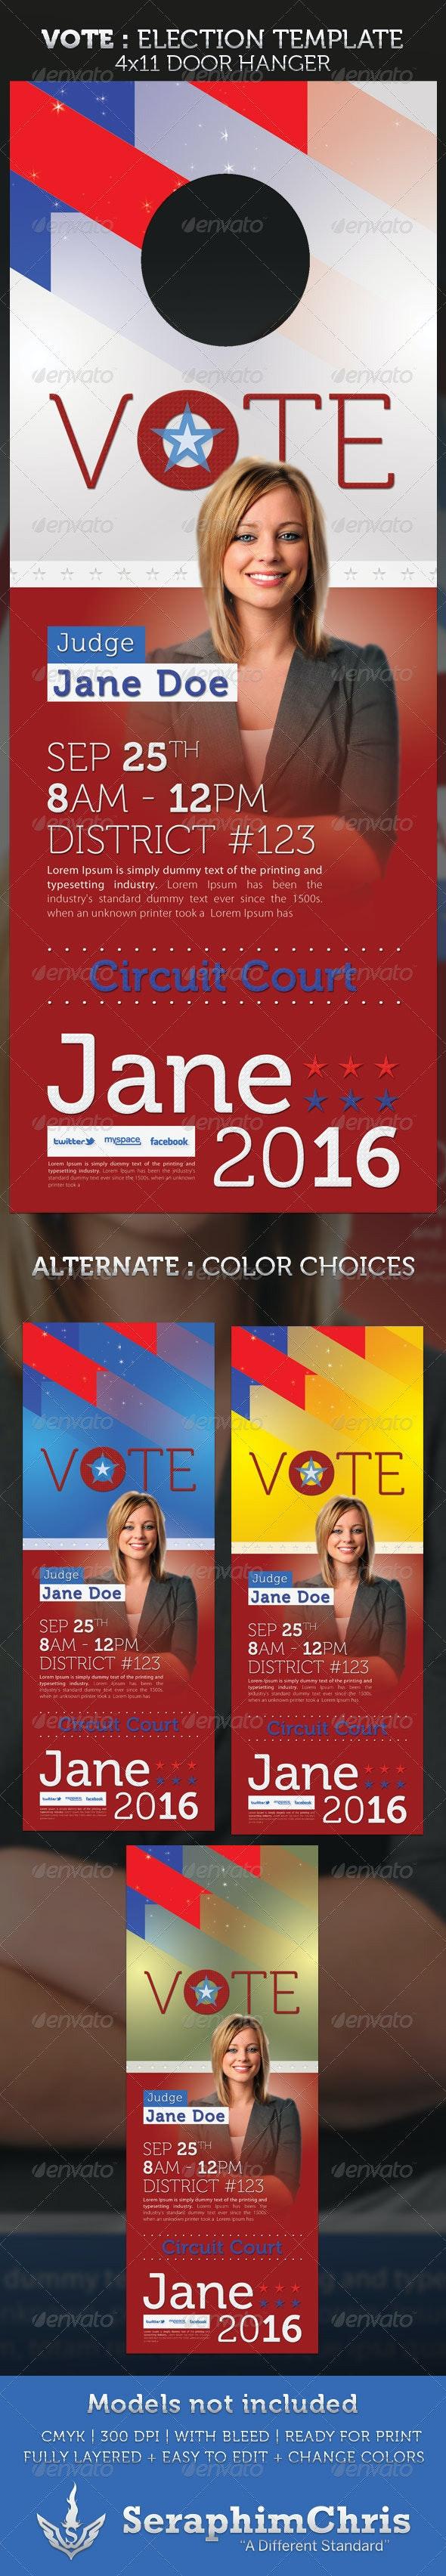 Vote - Election Door Hanger Template - Miscellaneous Print Templates